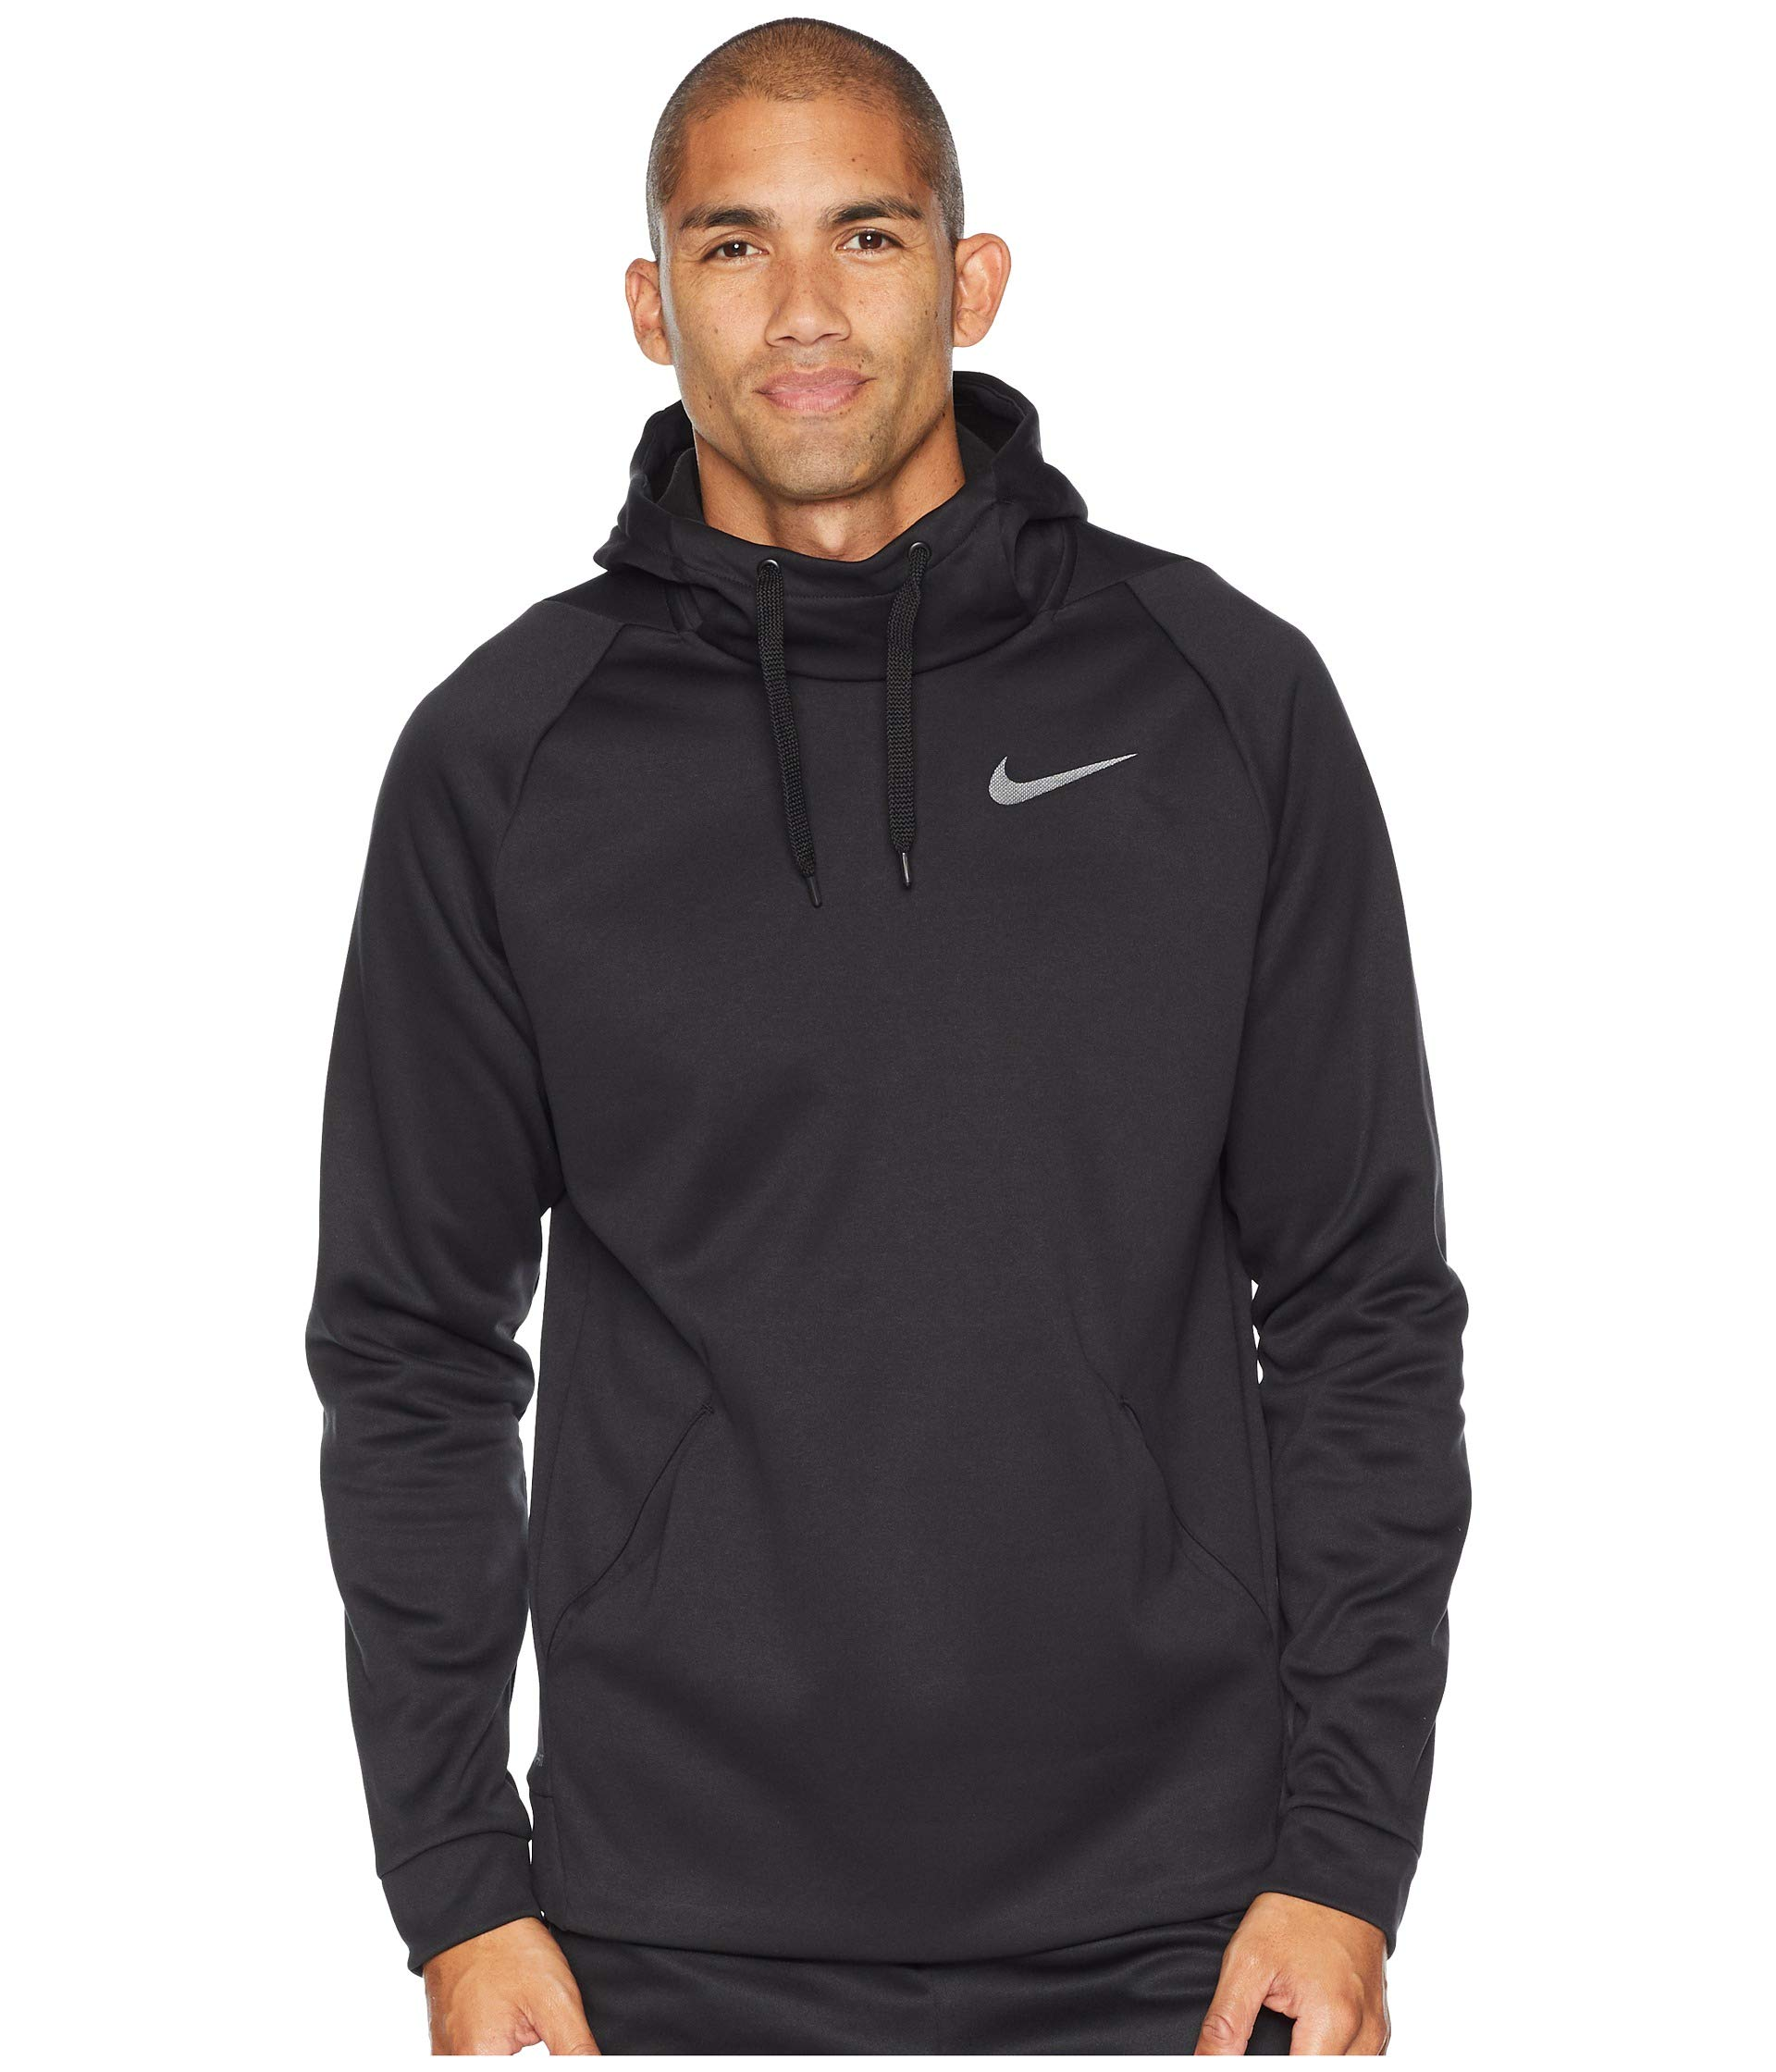 1b0be49faa54 Grey dark Pullover Hoodie Nike Thermal Black wZqTxzR